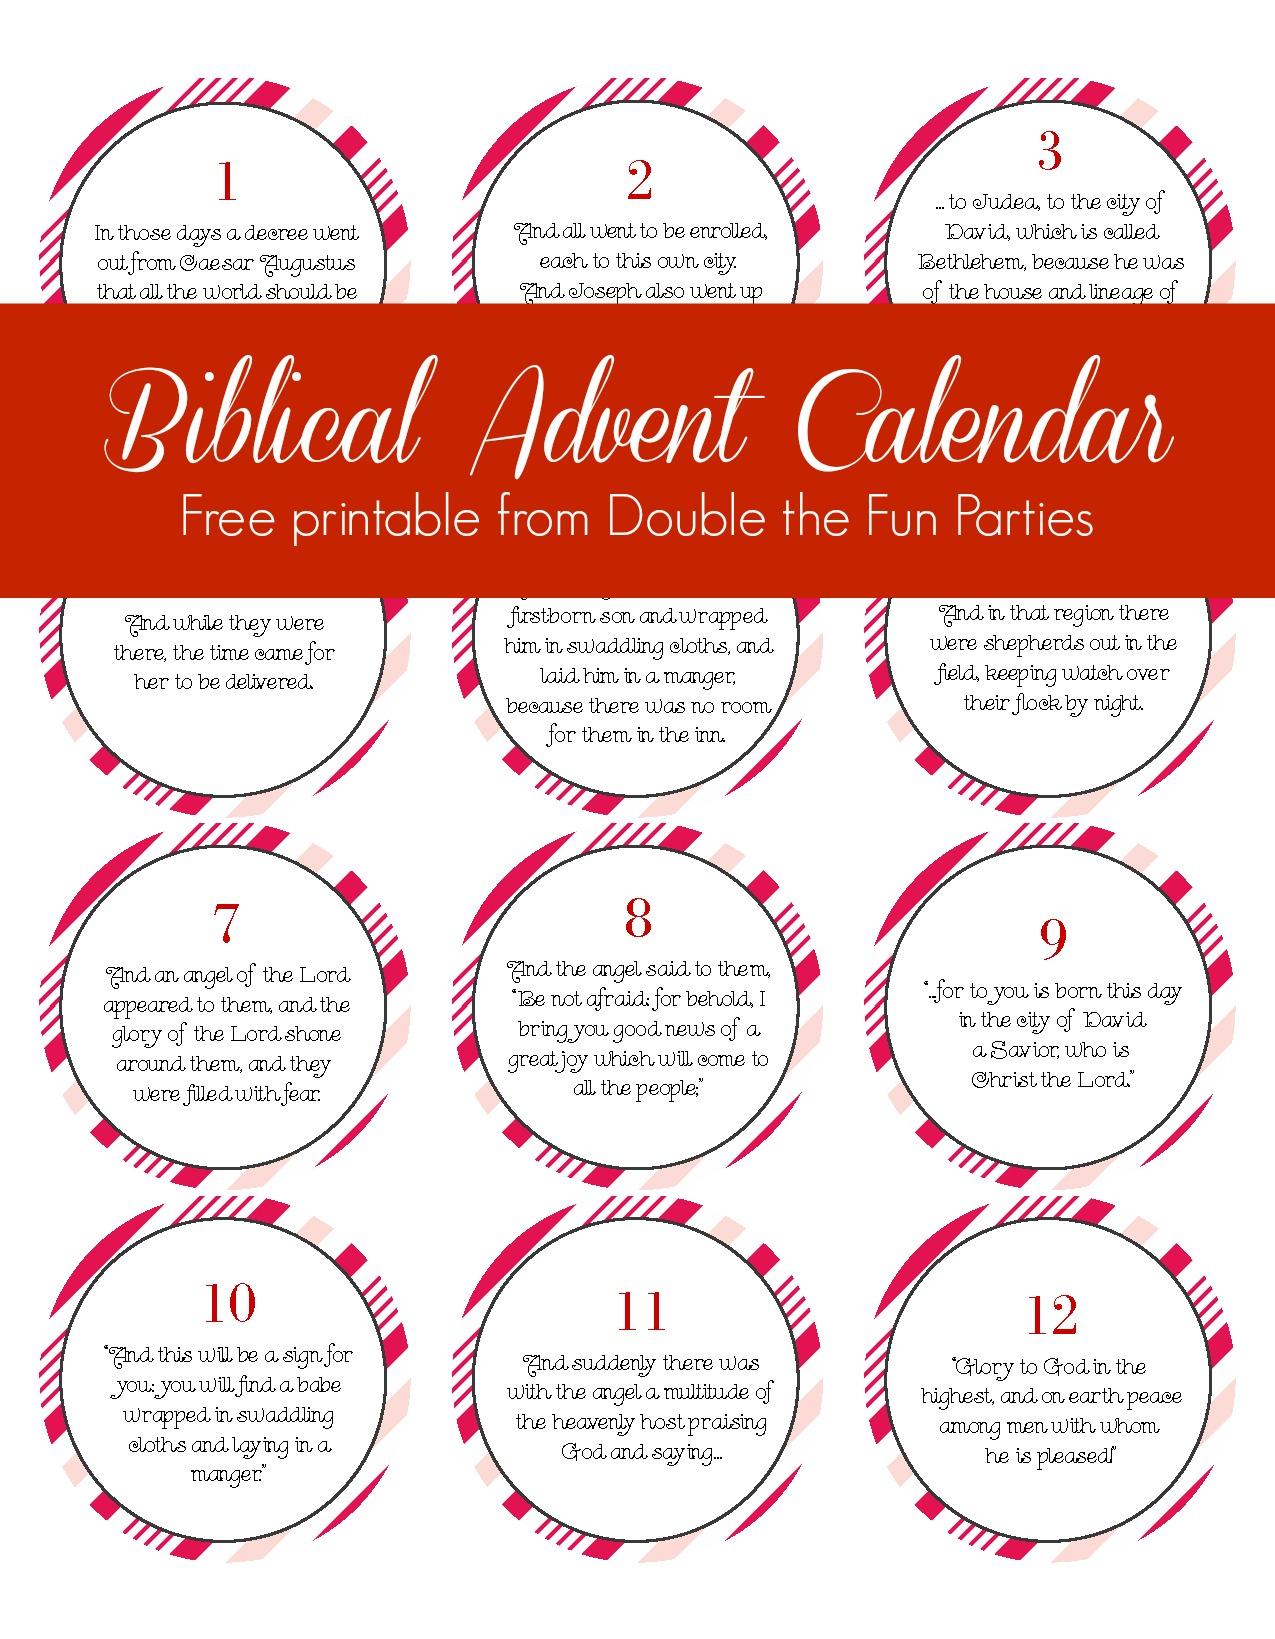 Free Biblical Advent Calendar Printable   The Party Teacher - Free Printable Nativity Story